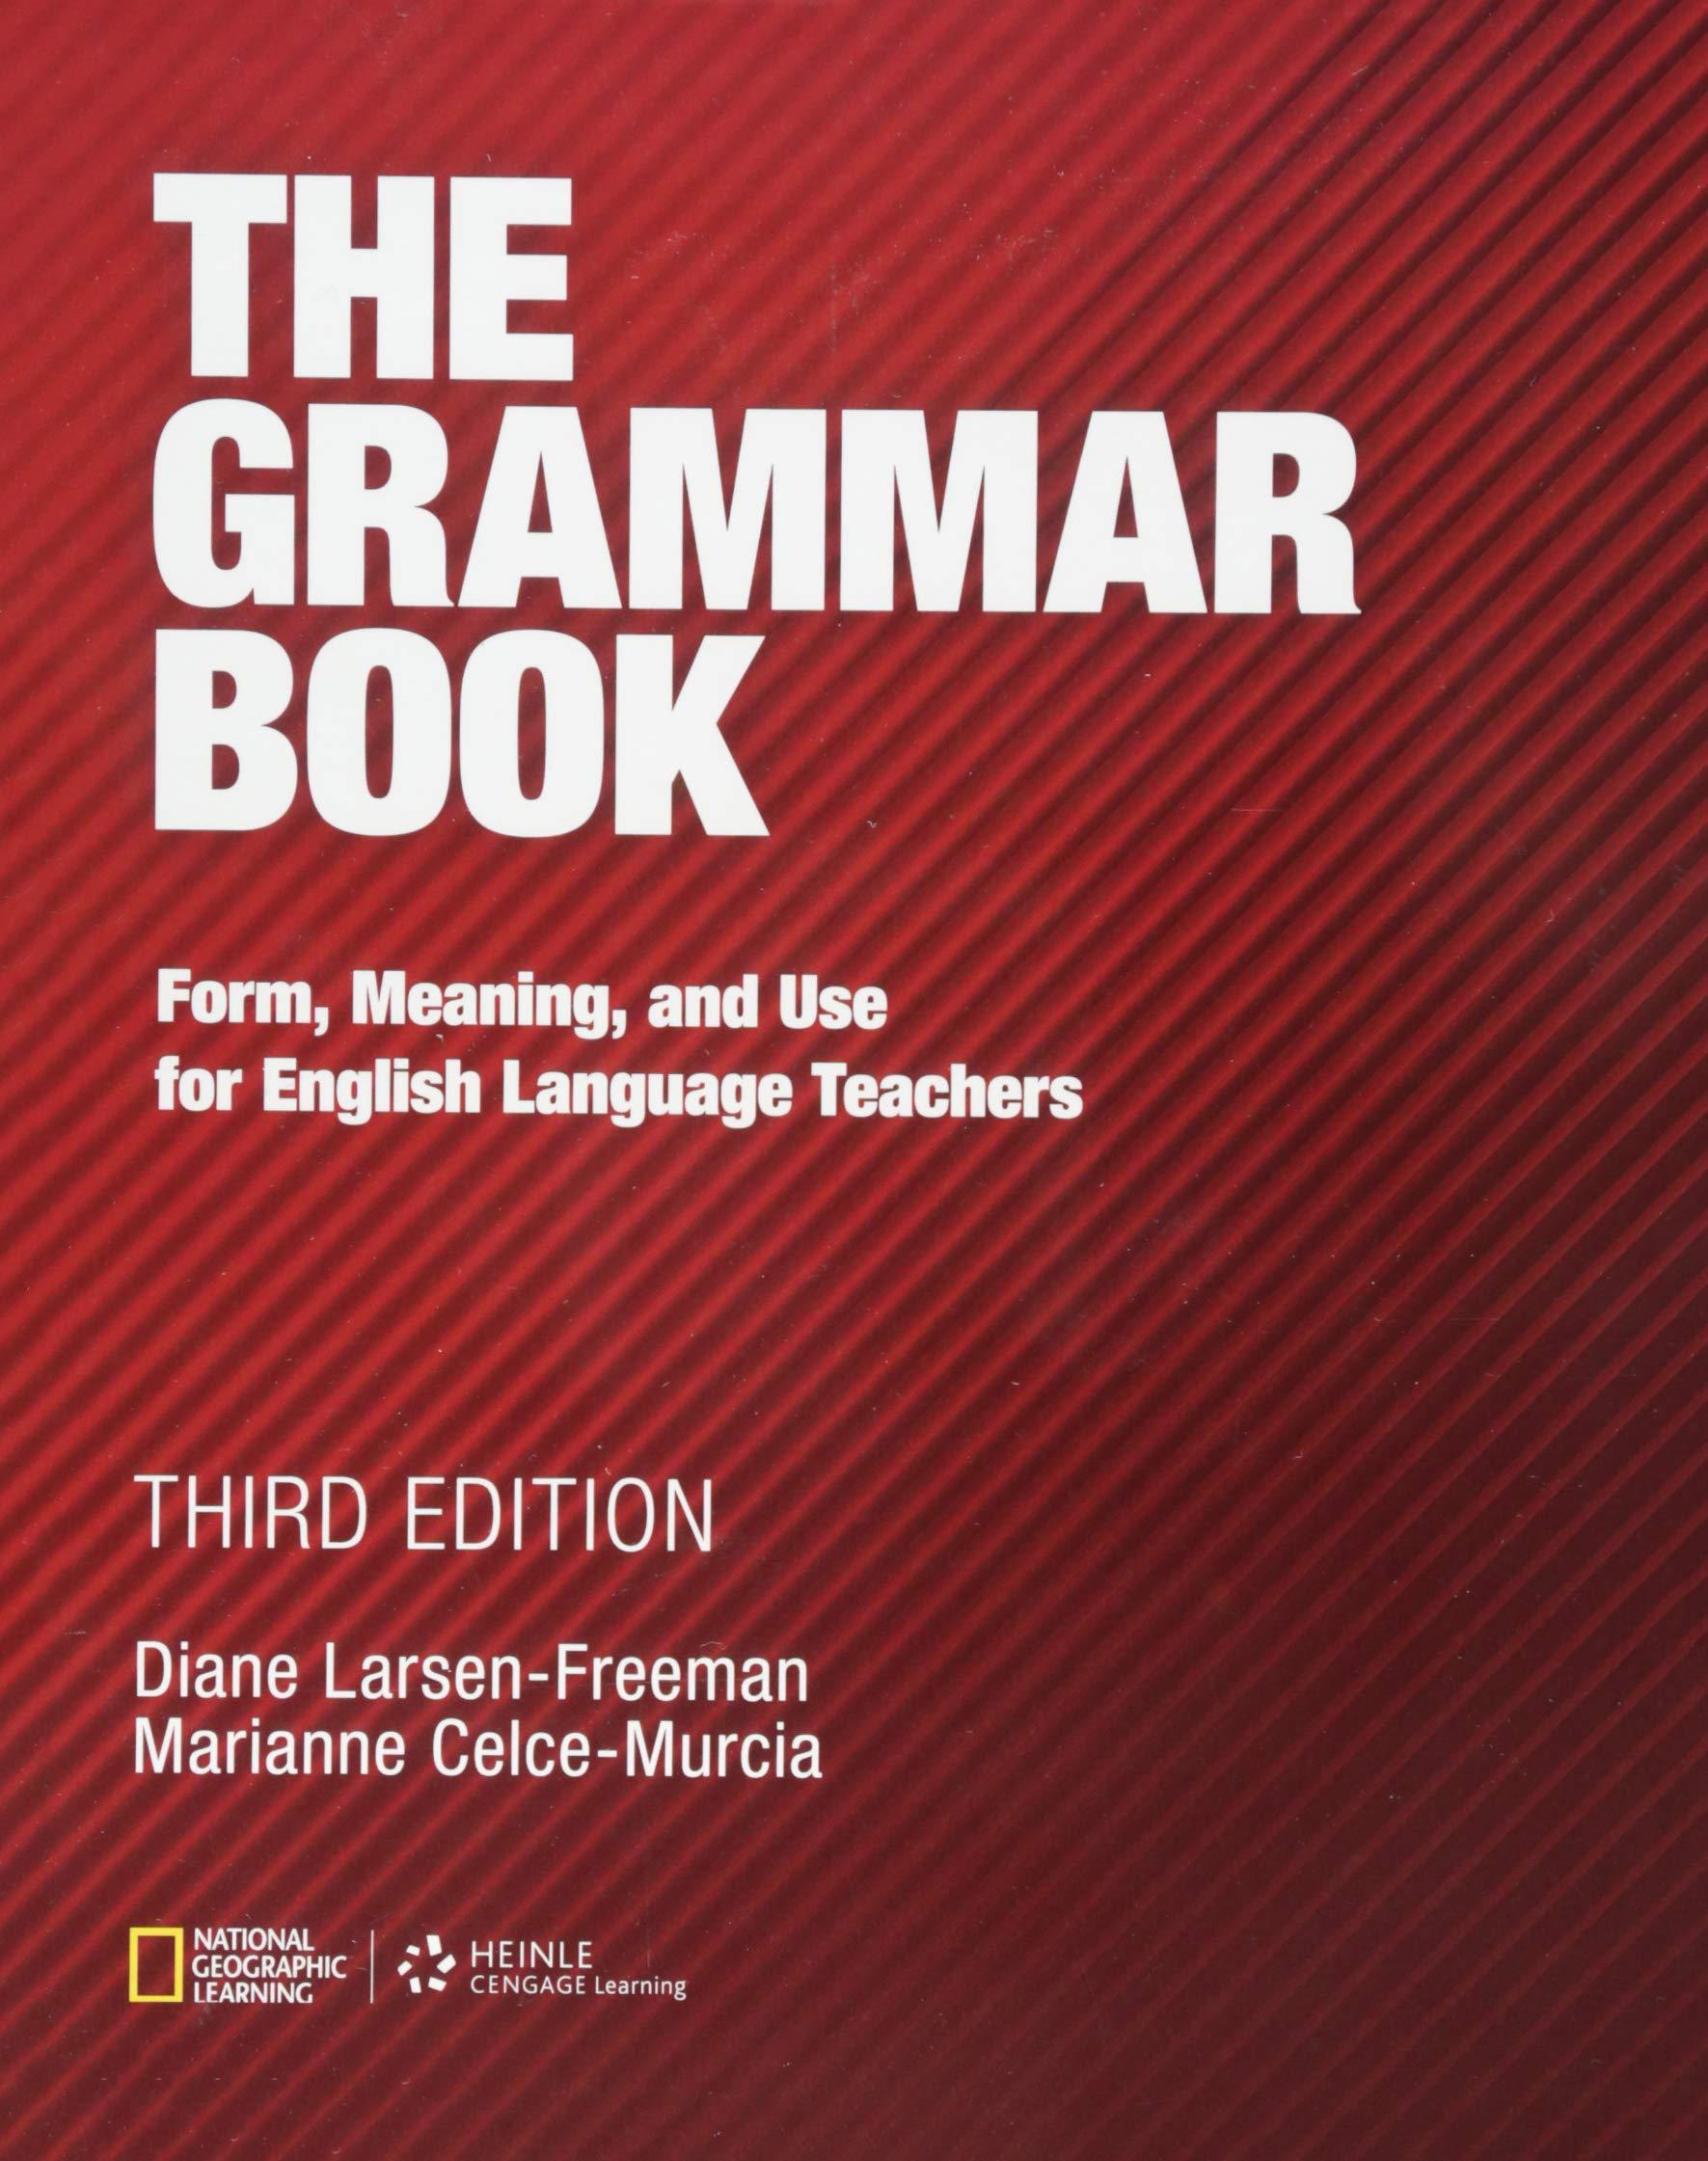 The Grammar Book: Amazon.es: Marianne (University of California, Los Angeles) Celce-Murcia, Diane Larsen-Freeman: Libros en idiomas extranjeros